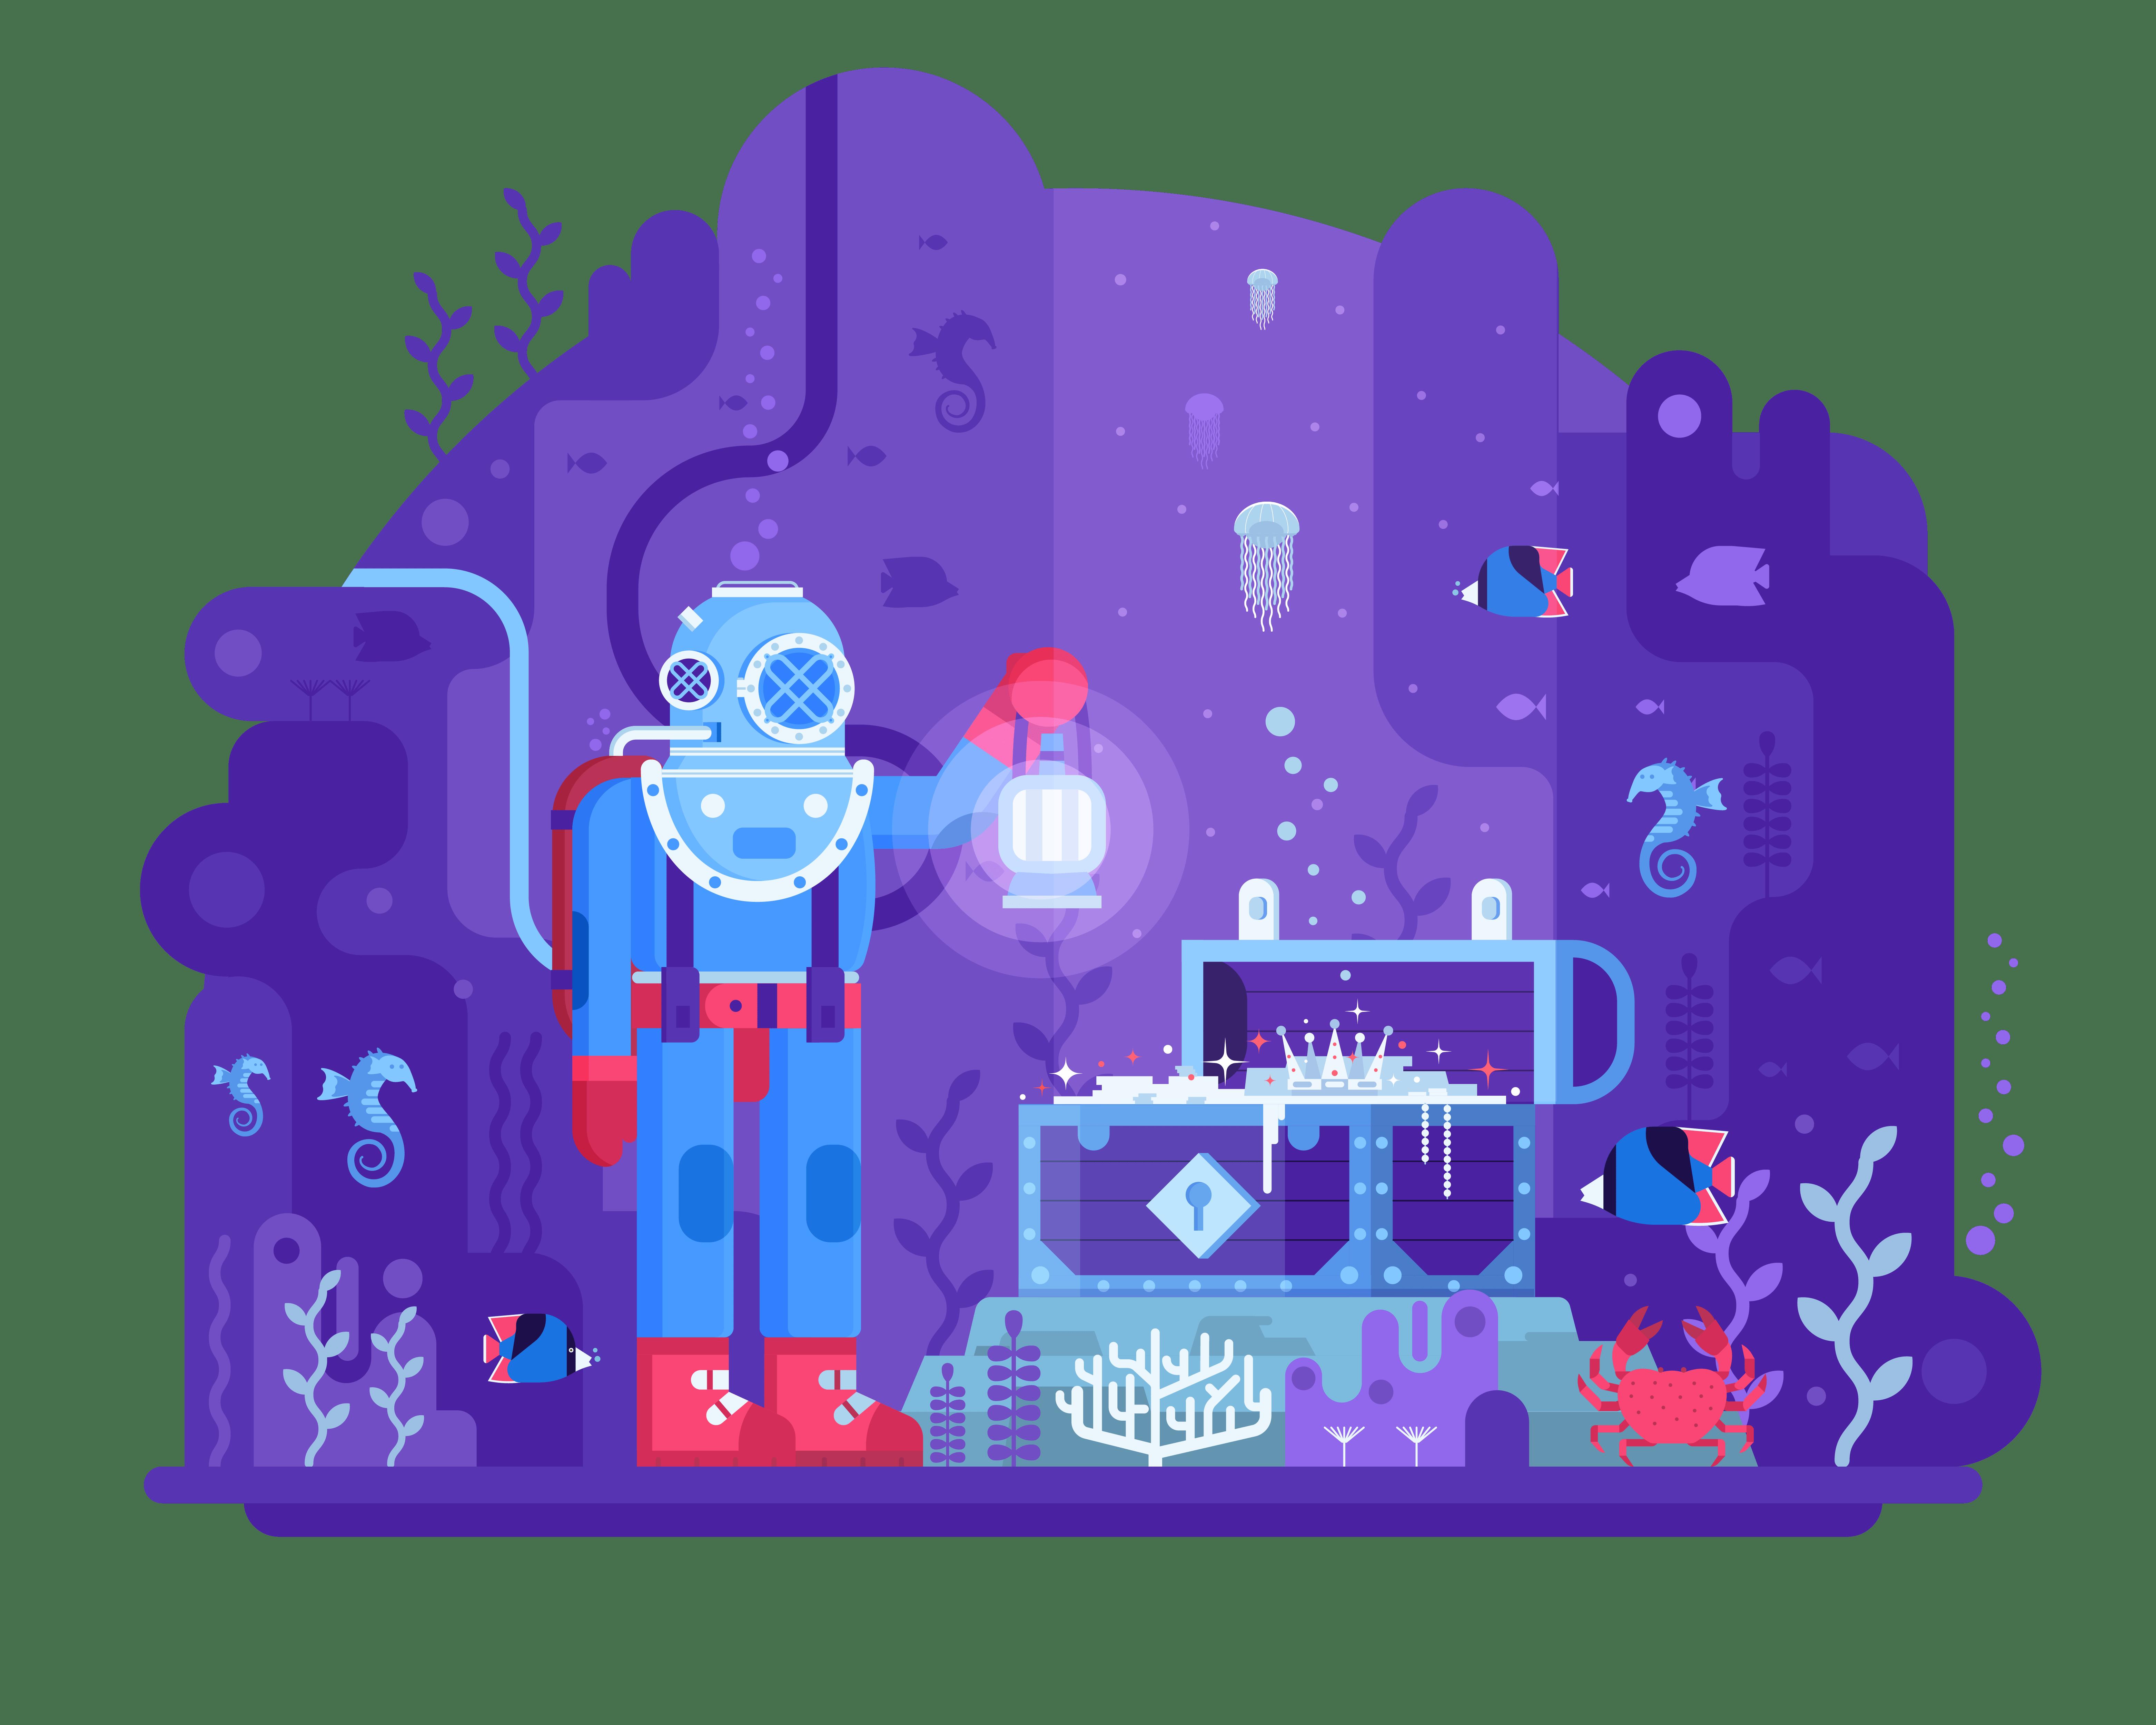 scuba-diving-vector-image